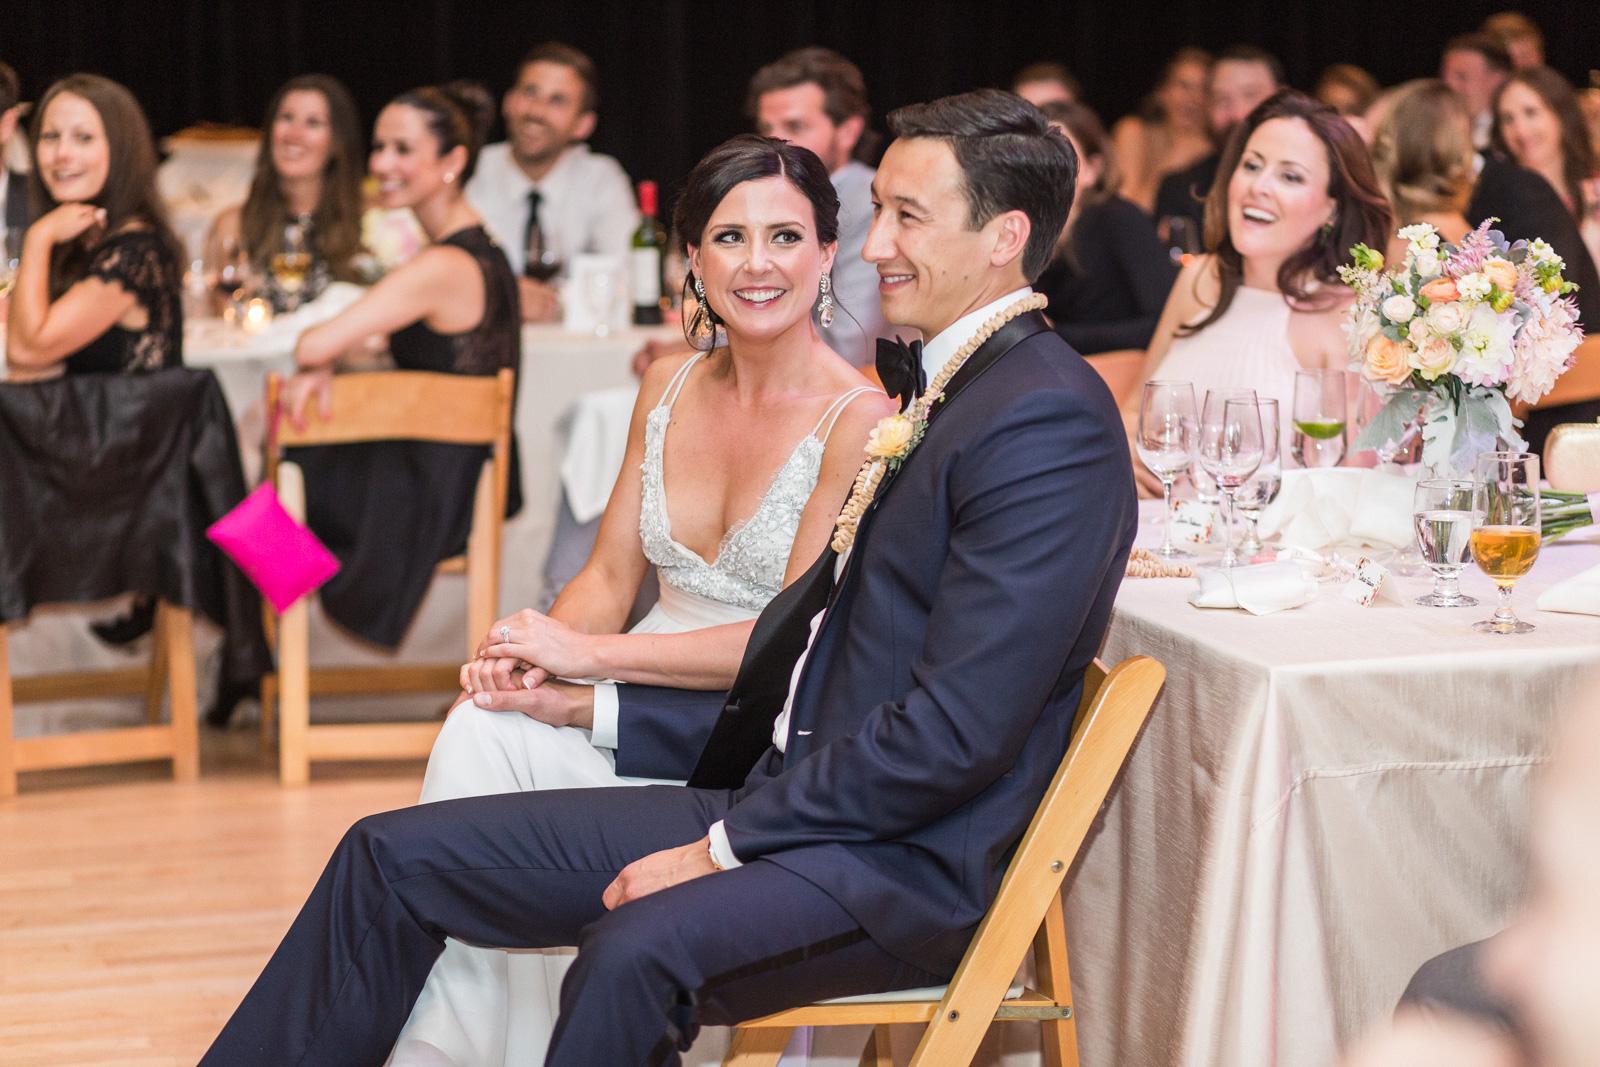 performance works wedding john bello (14 of 17)